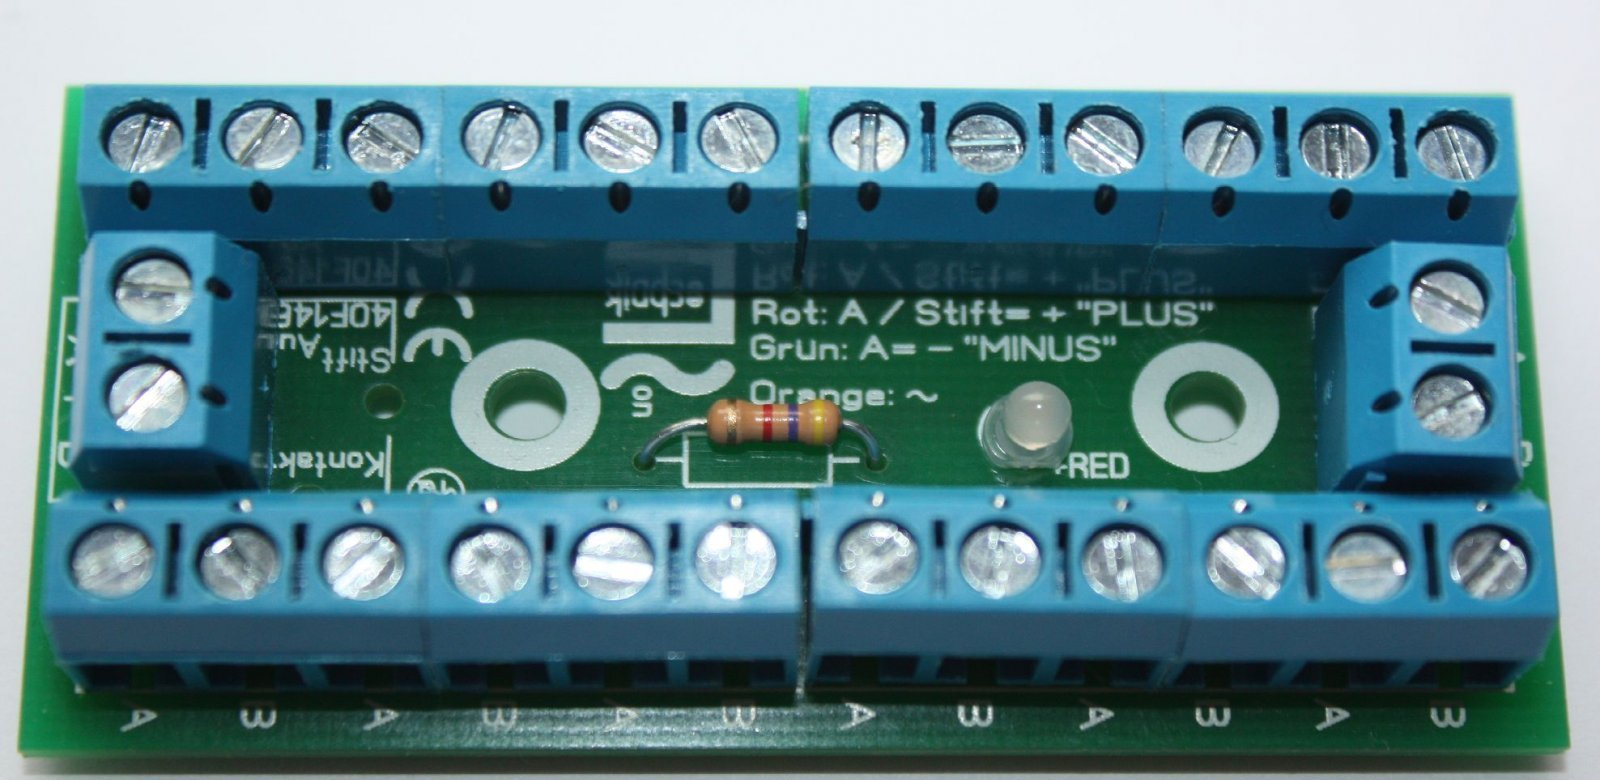 10x Bausatz Stromverteiler Modellbahn mit Status LED - 30V - 10 Stück - fertig